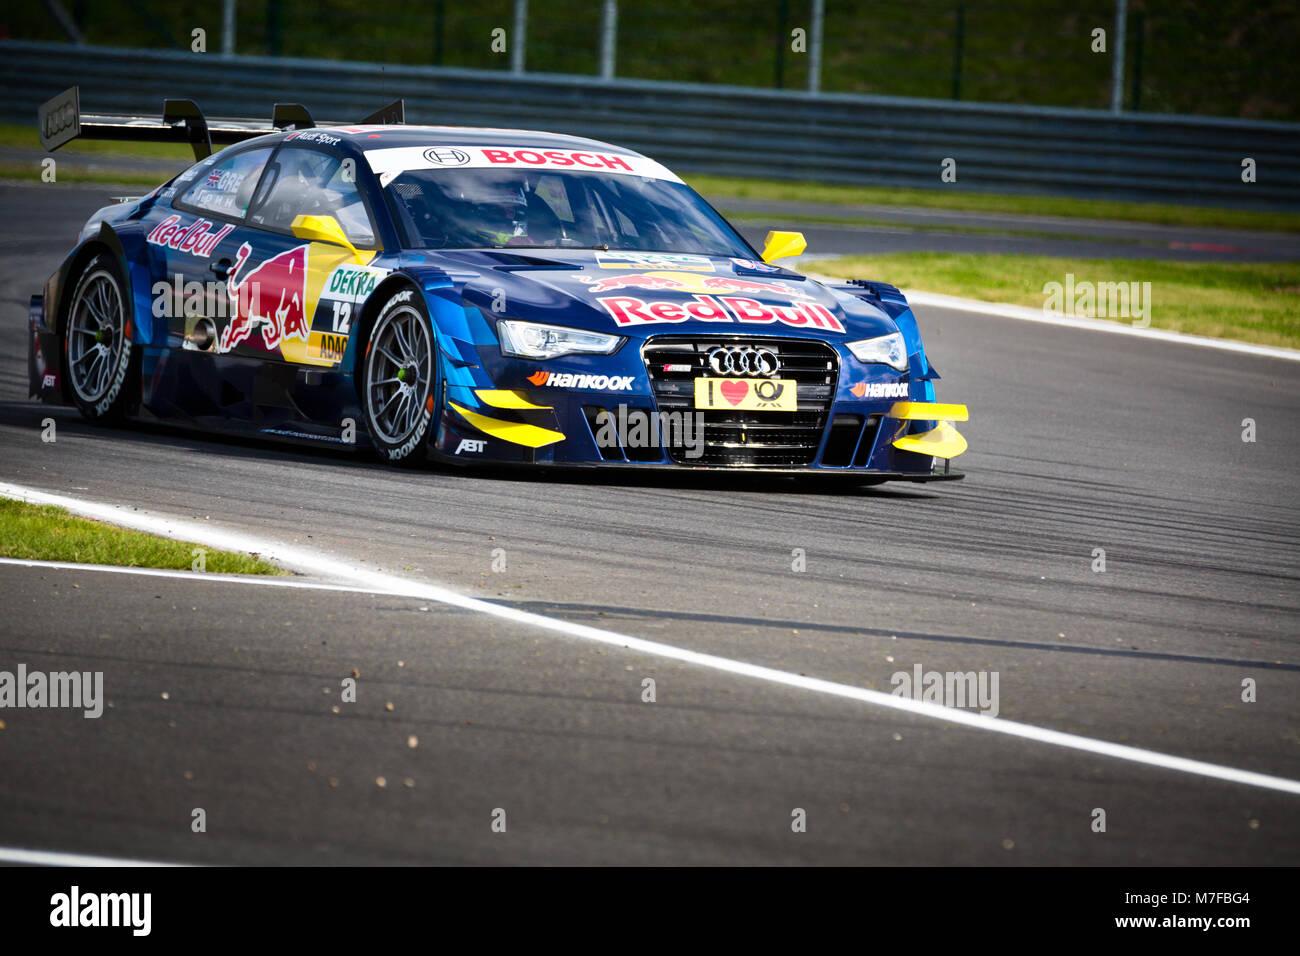 Audi RS 5 DTM car of Audi Sport Abt Sportsline Team participates in the Deutsche Tourenwagen Masters racing series - Stock Image